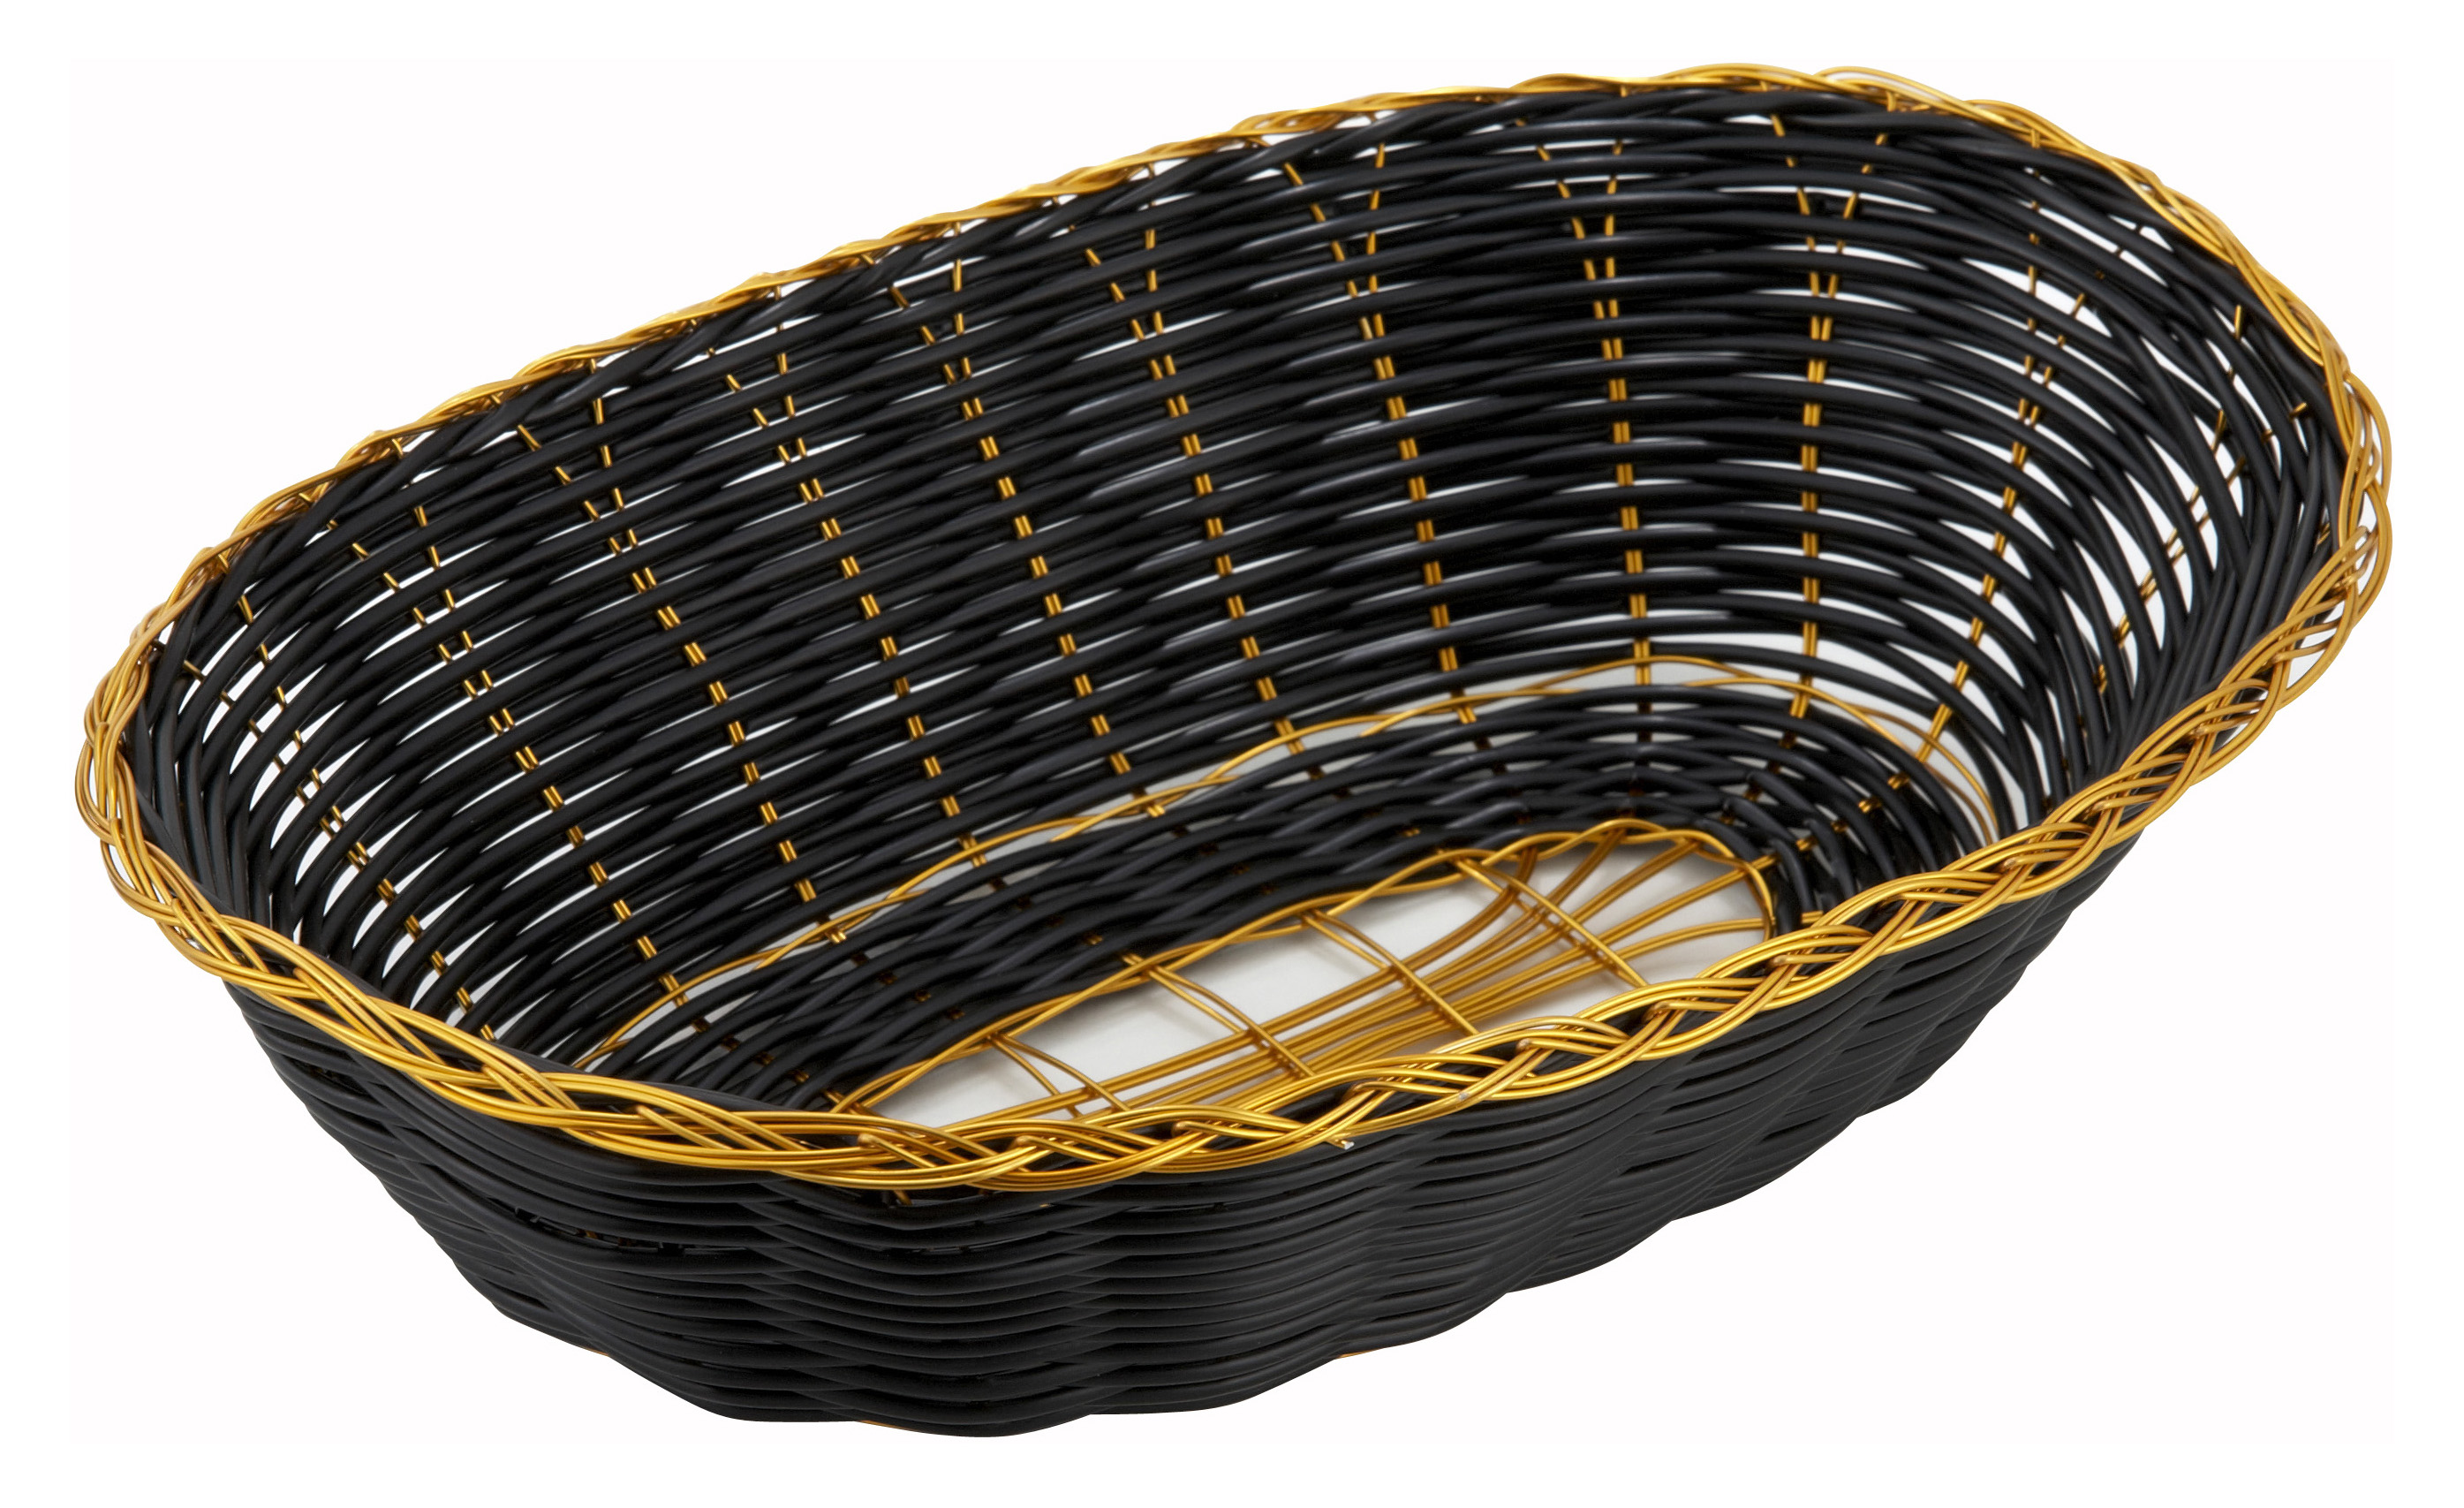 Winco PWBK-9V woven baskets